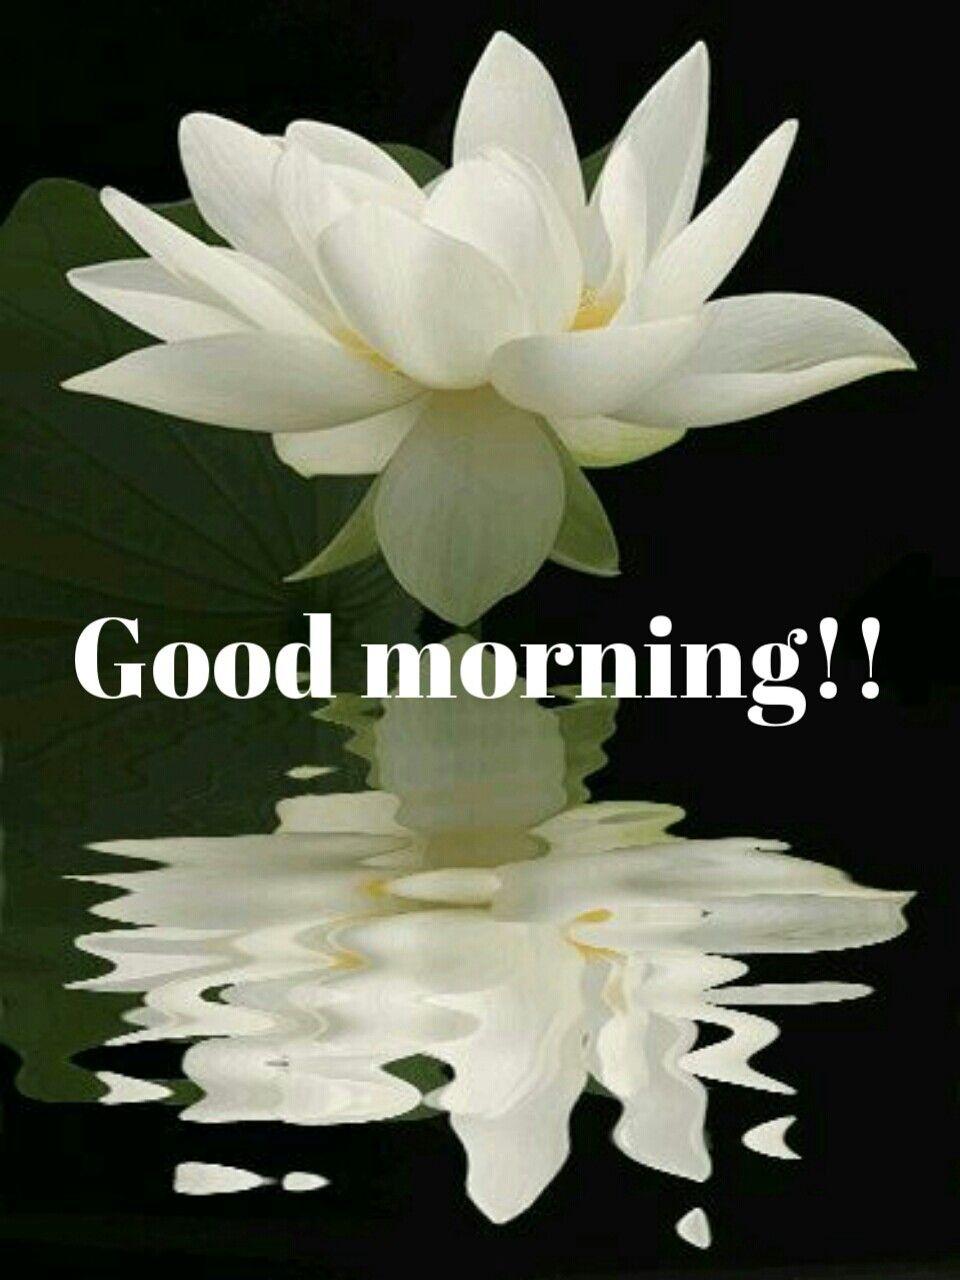 Good morning good morning pinterest flowers beautiful lotus flowers lotus blossoms pretty flowers white lotus flower izmirmasajfo